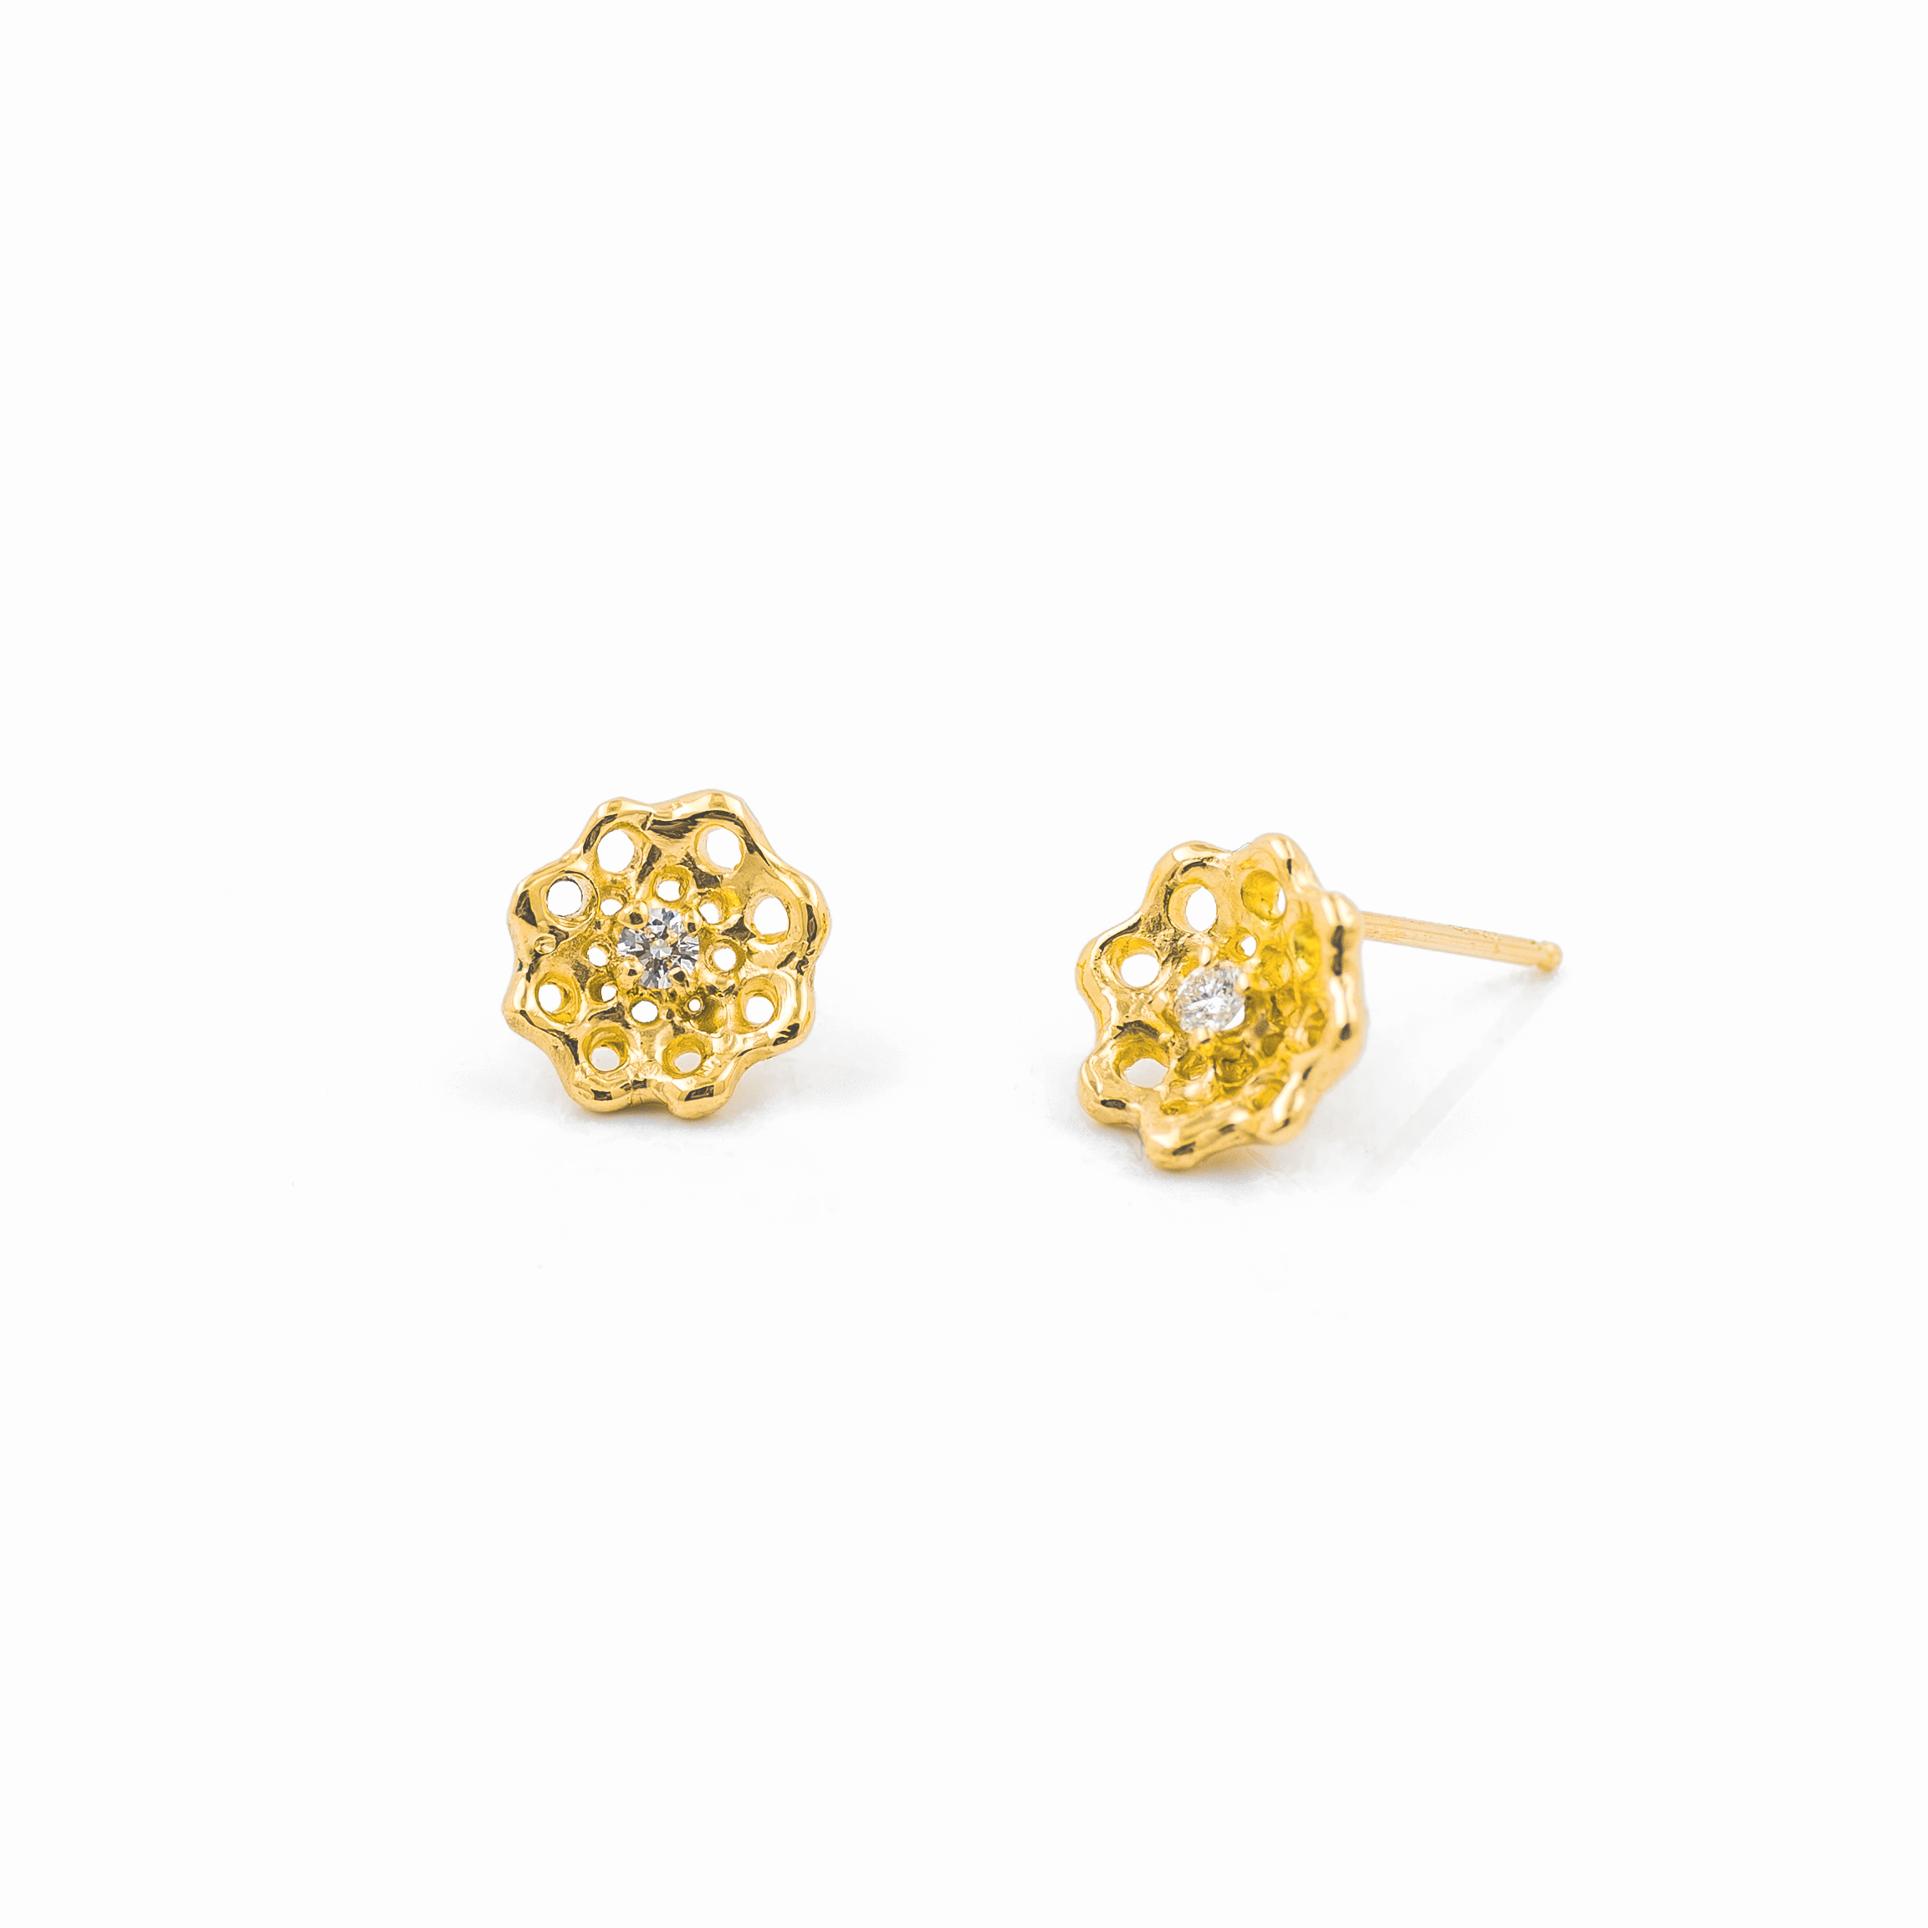 Cusp Earrings: Yellow gold and white diamonds.